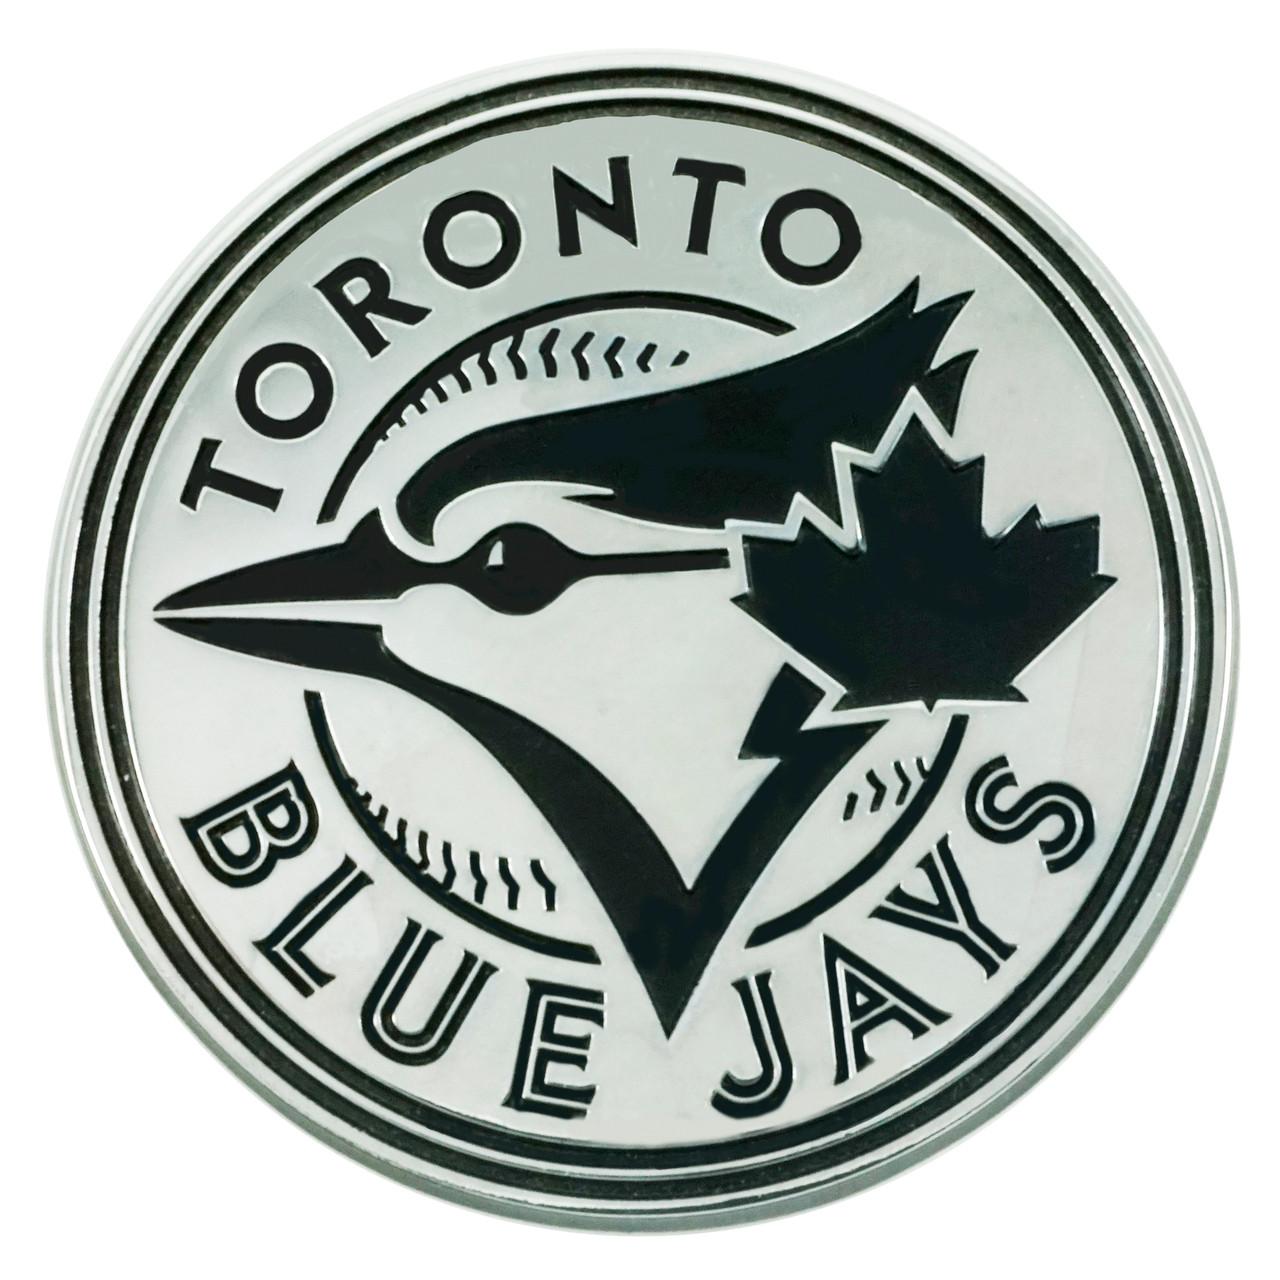 Toronto Blue Jays Auto Emblem Premium Metal Chrome Special Order